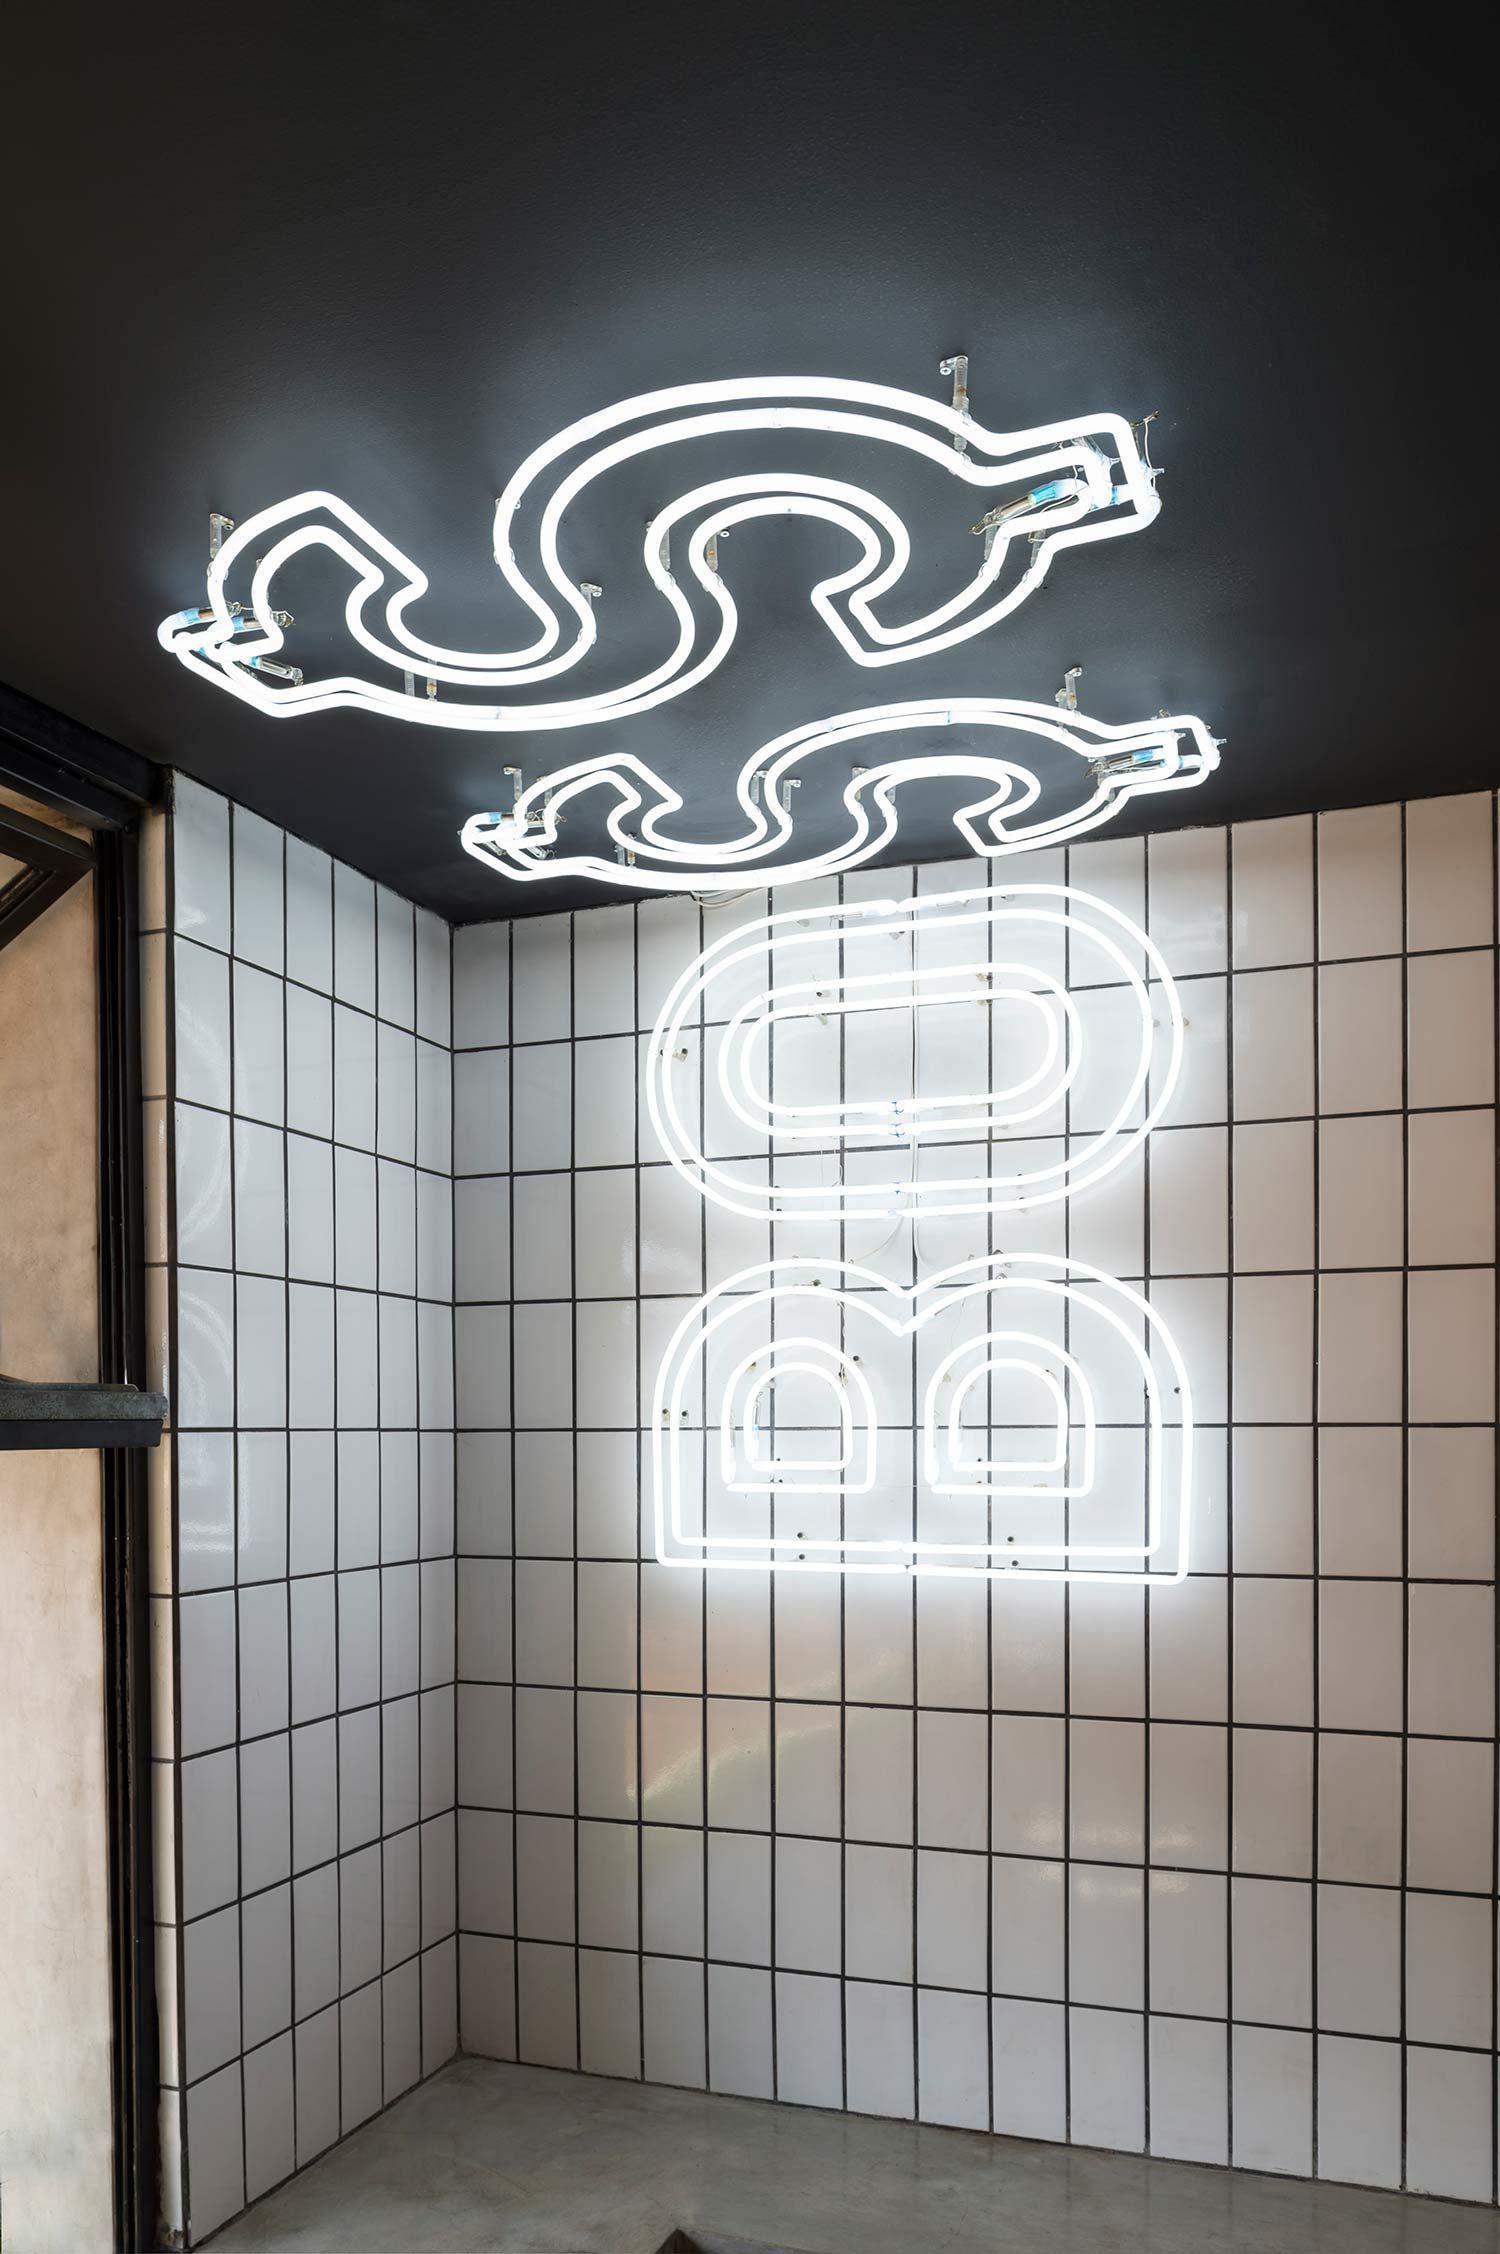 BO$$ Man Bali: Gourmet with Attitude | Neon Signs | Neon